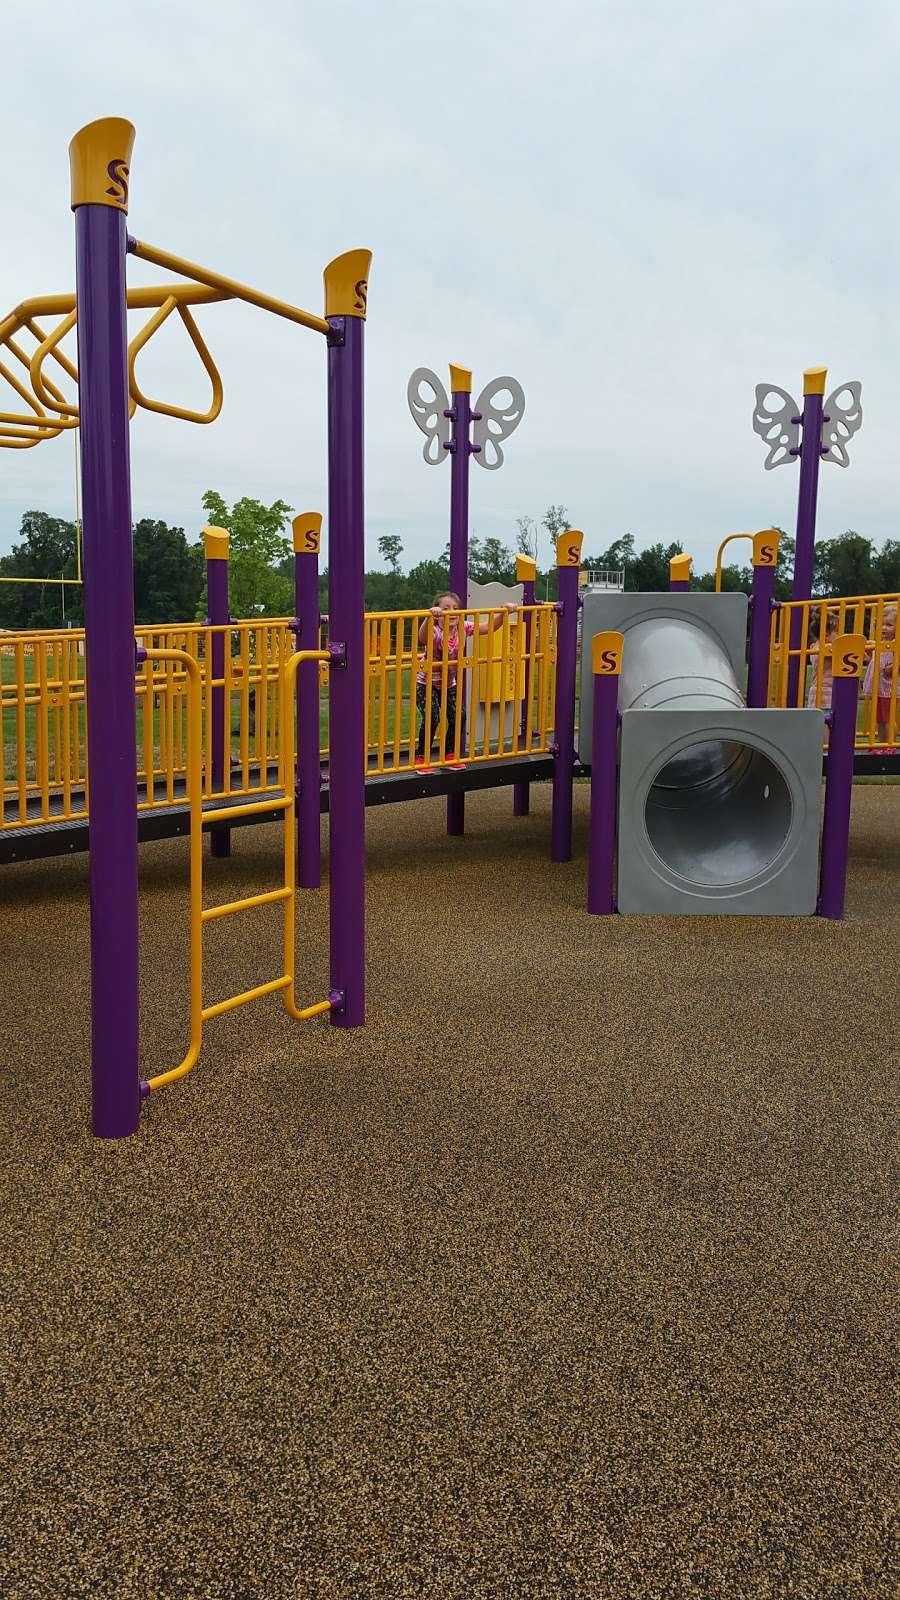 Liberty Park II - park  | Photo 4 of 10 | Address: 1400 W Park Ave, Tinton Falls, NJ 07712, USA | Phone: (732) 542-3400